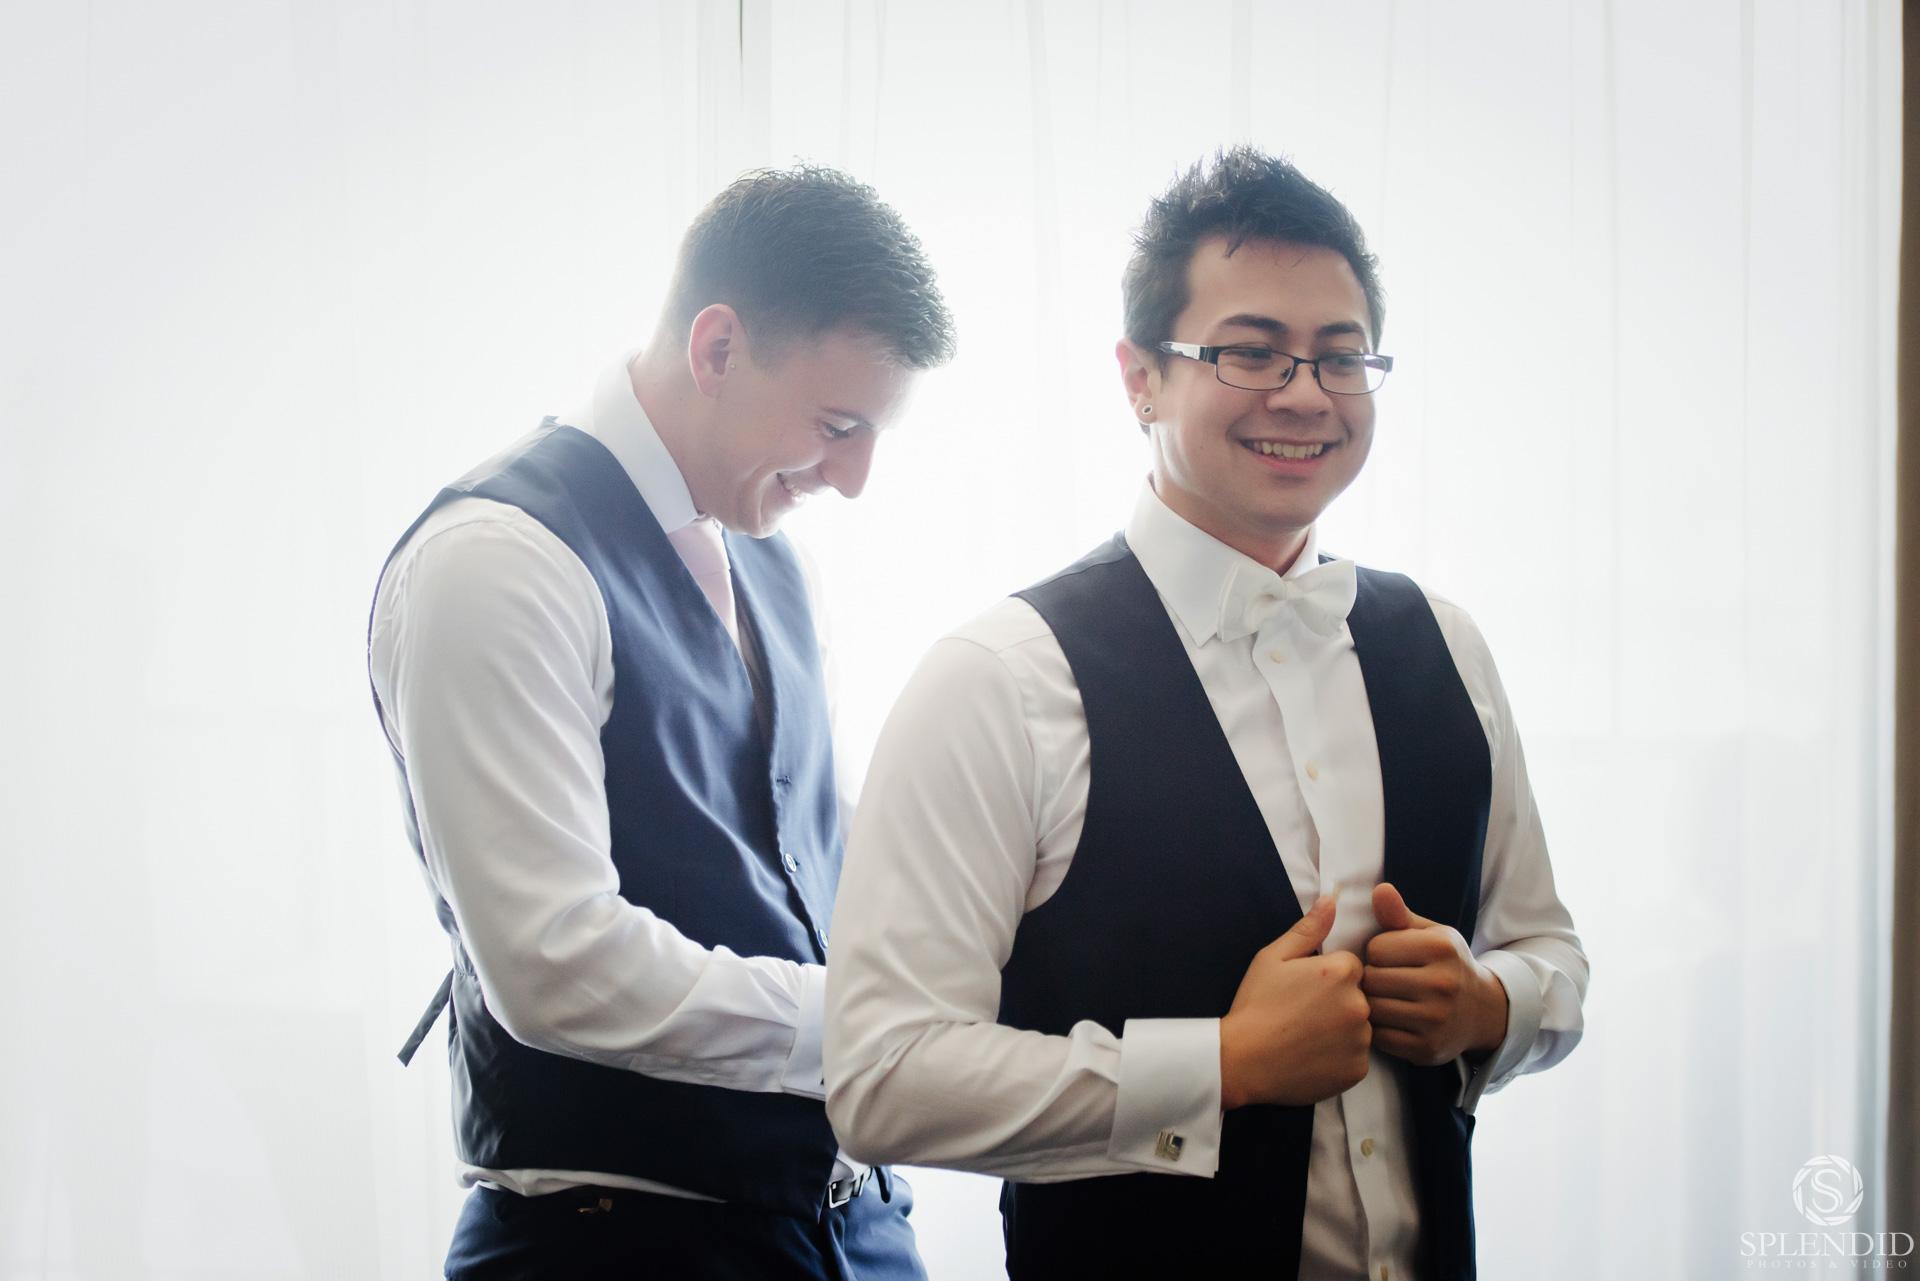 L'Aqua Wedding: Krisdelle & Daniel 6